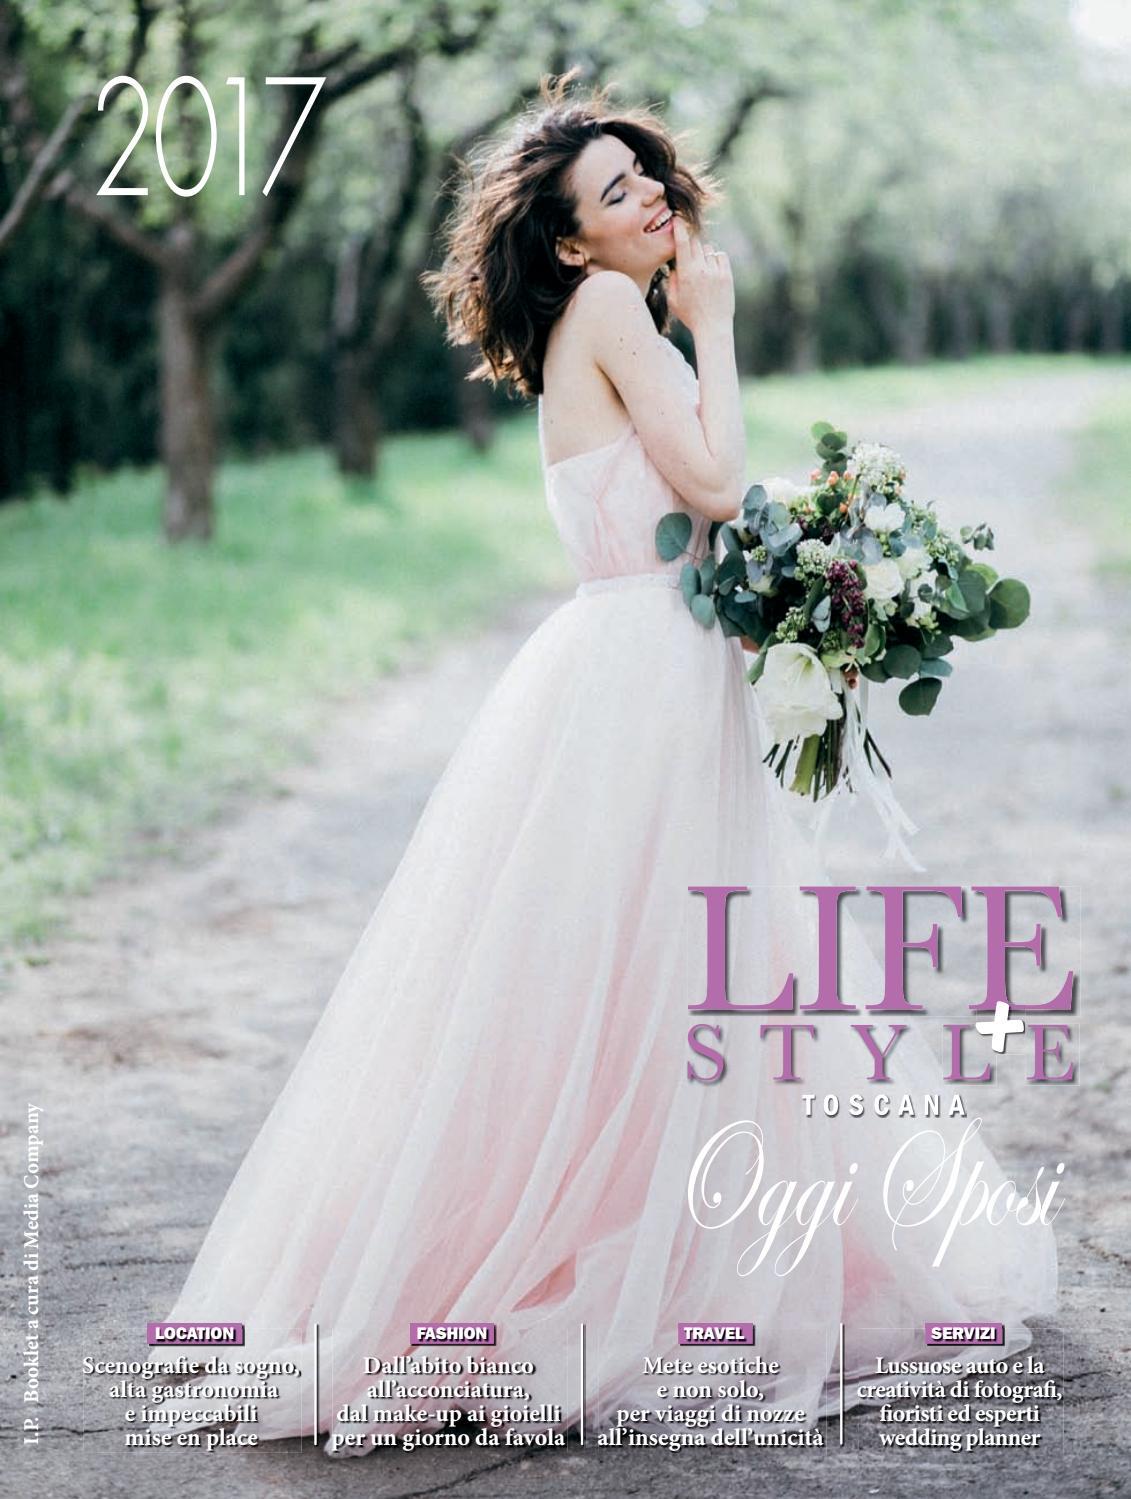 ed92d0d3d4ba Life style OGGI SPOSI - Settembre 2017 by Media Company - issuu